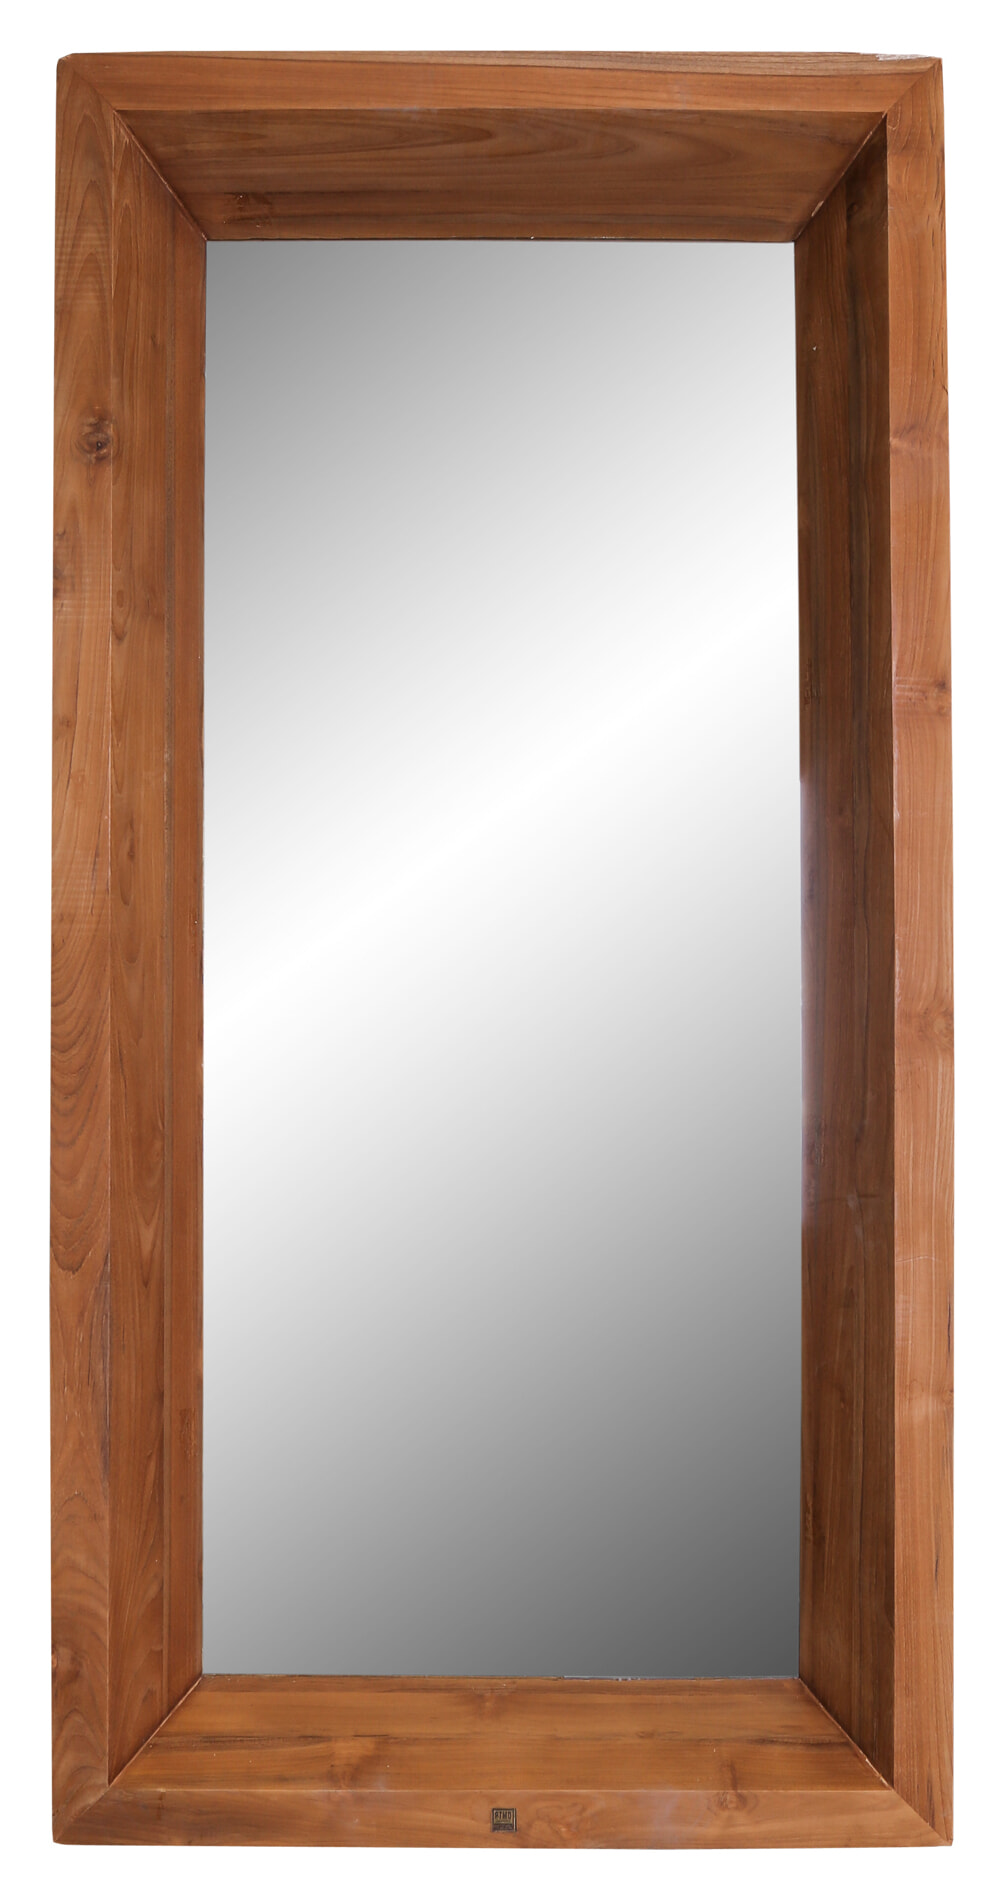 PTMD Spiegel 'Ewan' 160 x 80cm